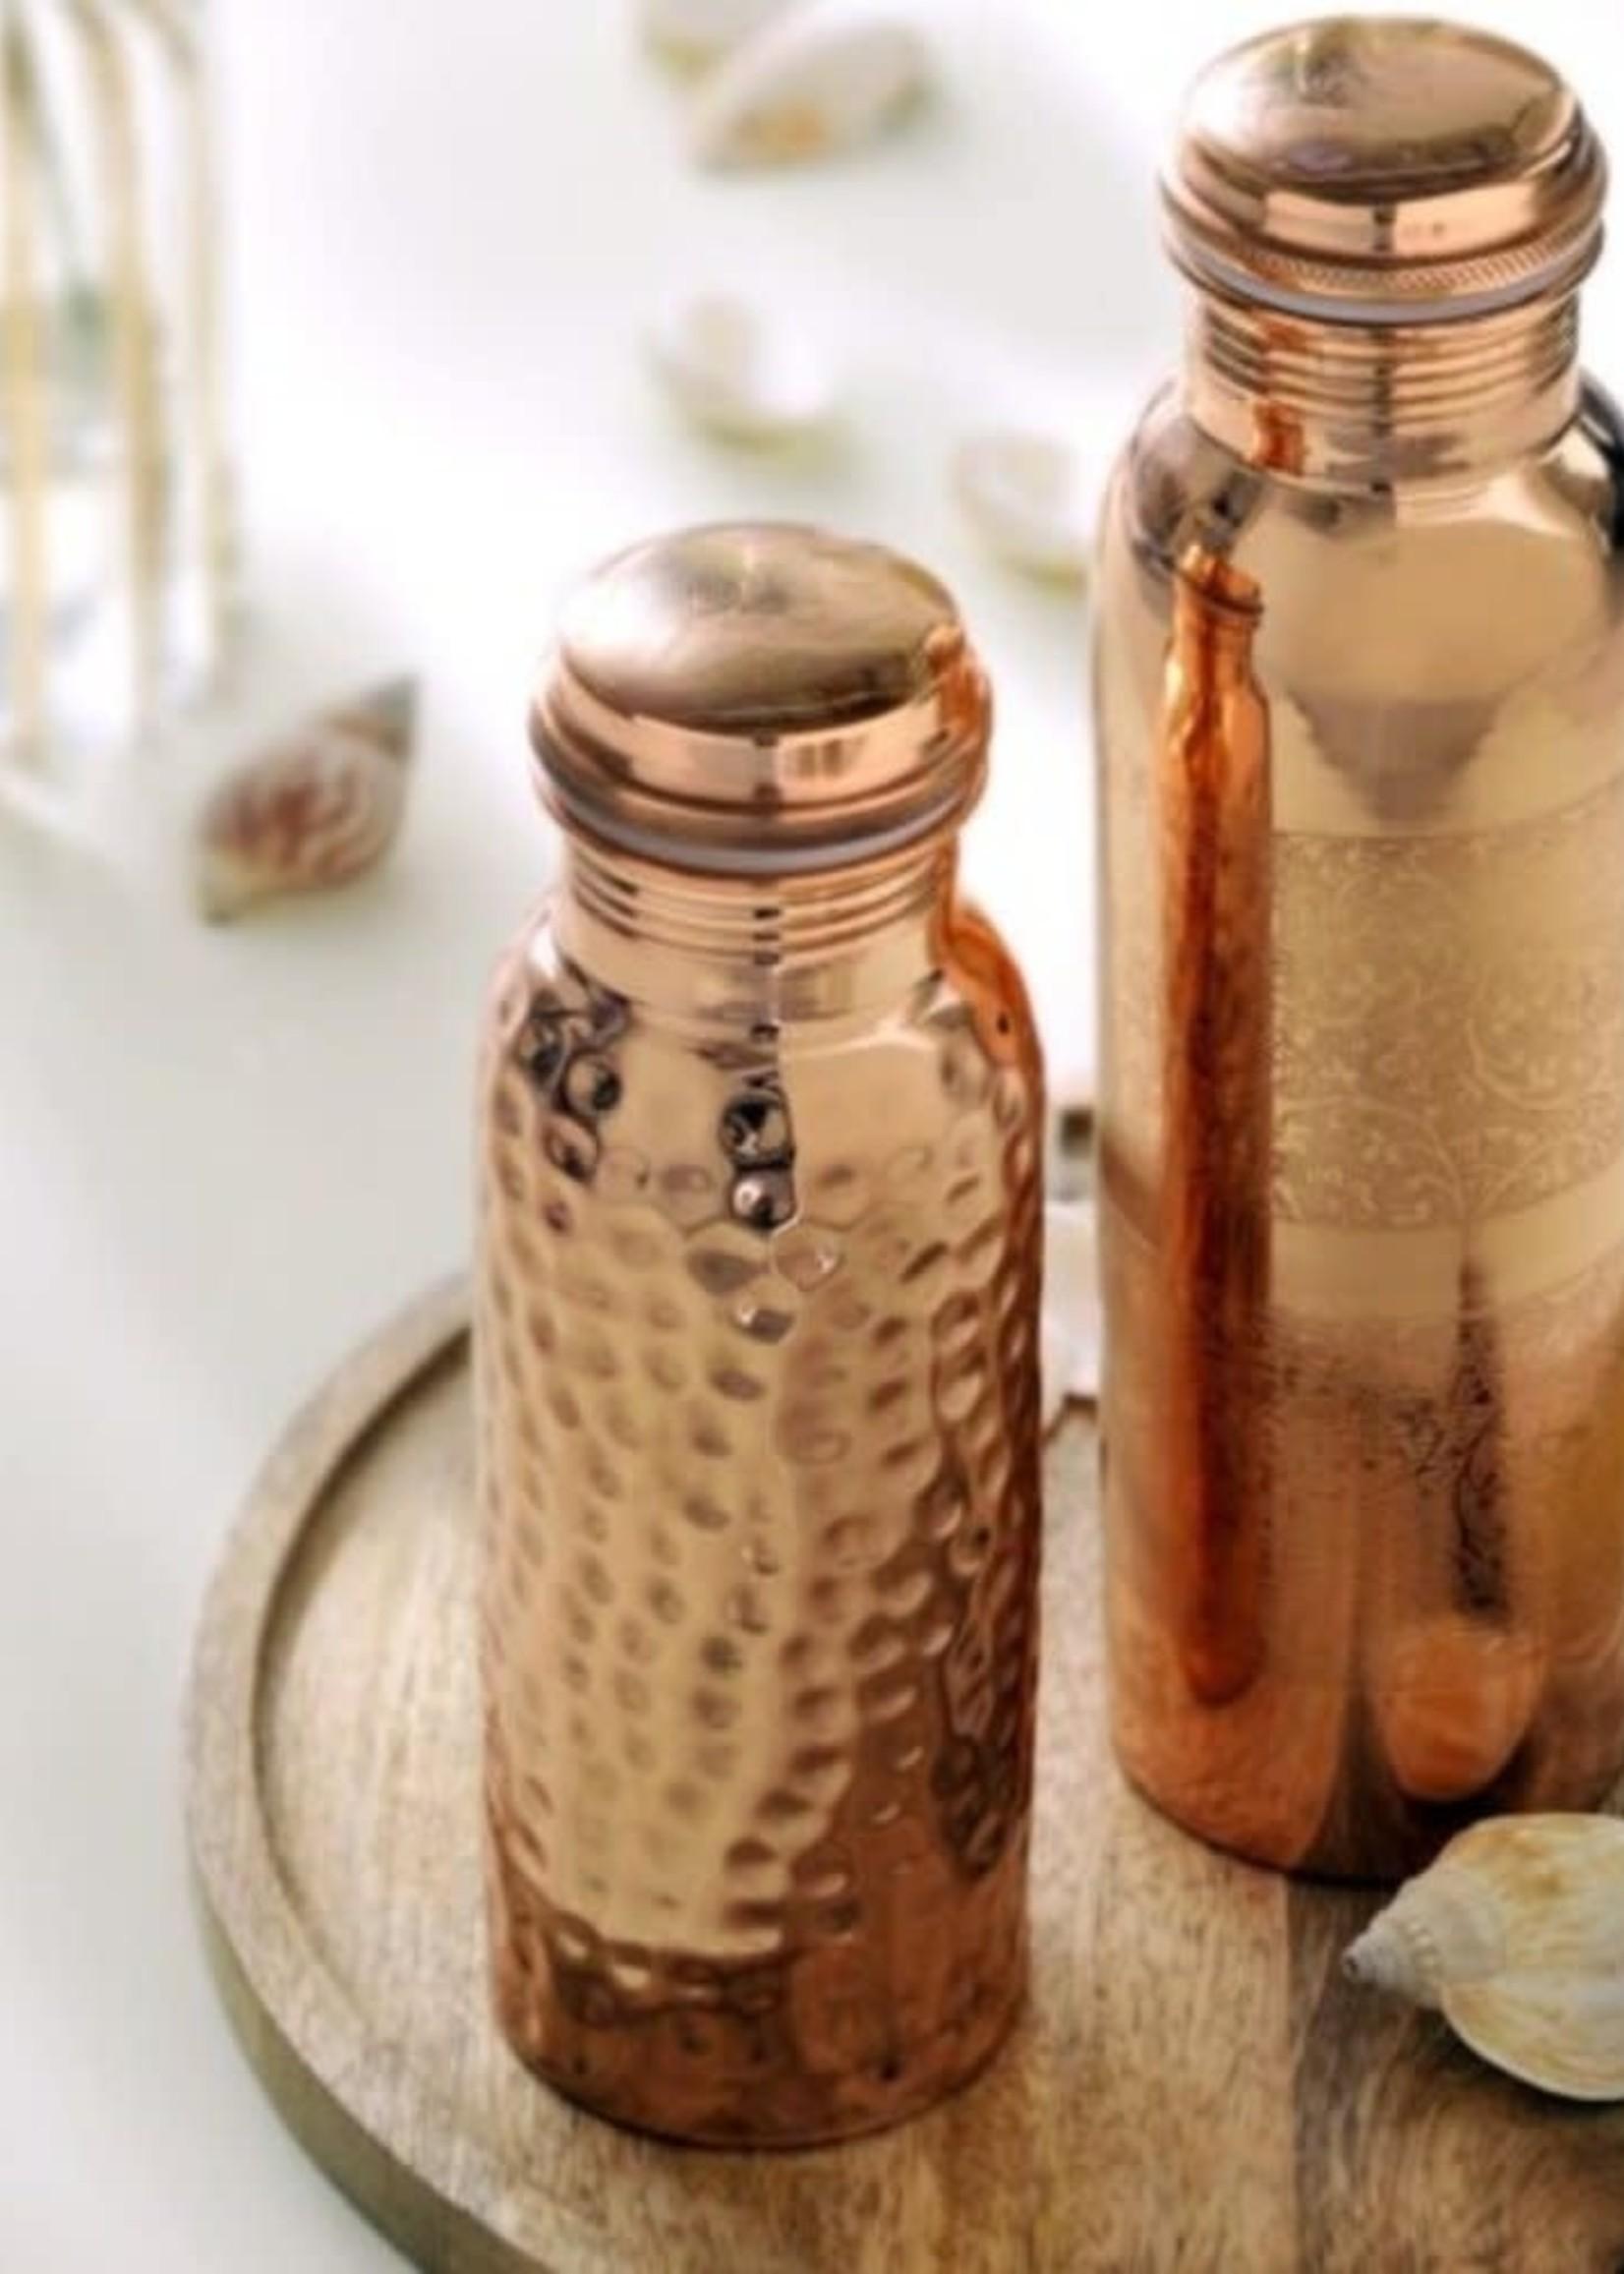 Forrest & Love Forrest & Love - Copper Luxury engraved water bottle 600 ml